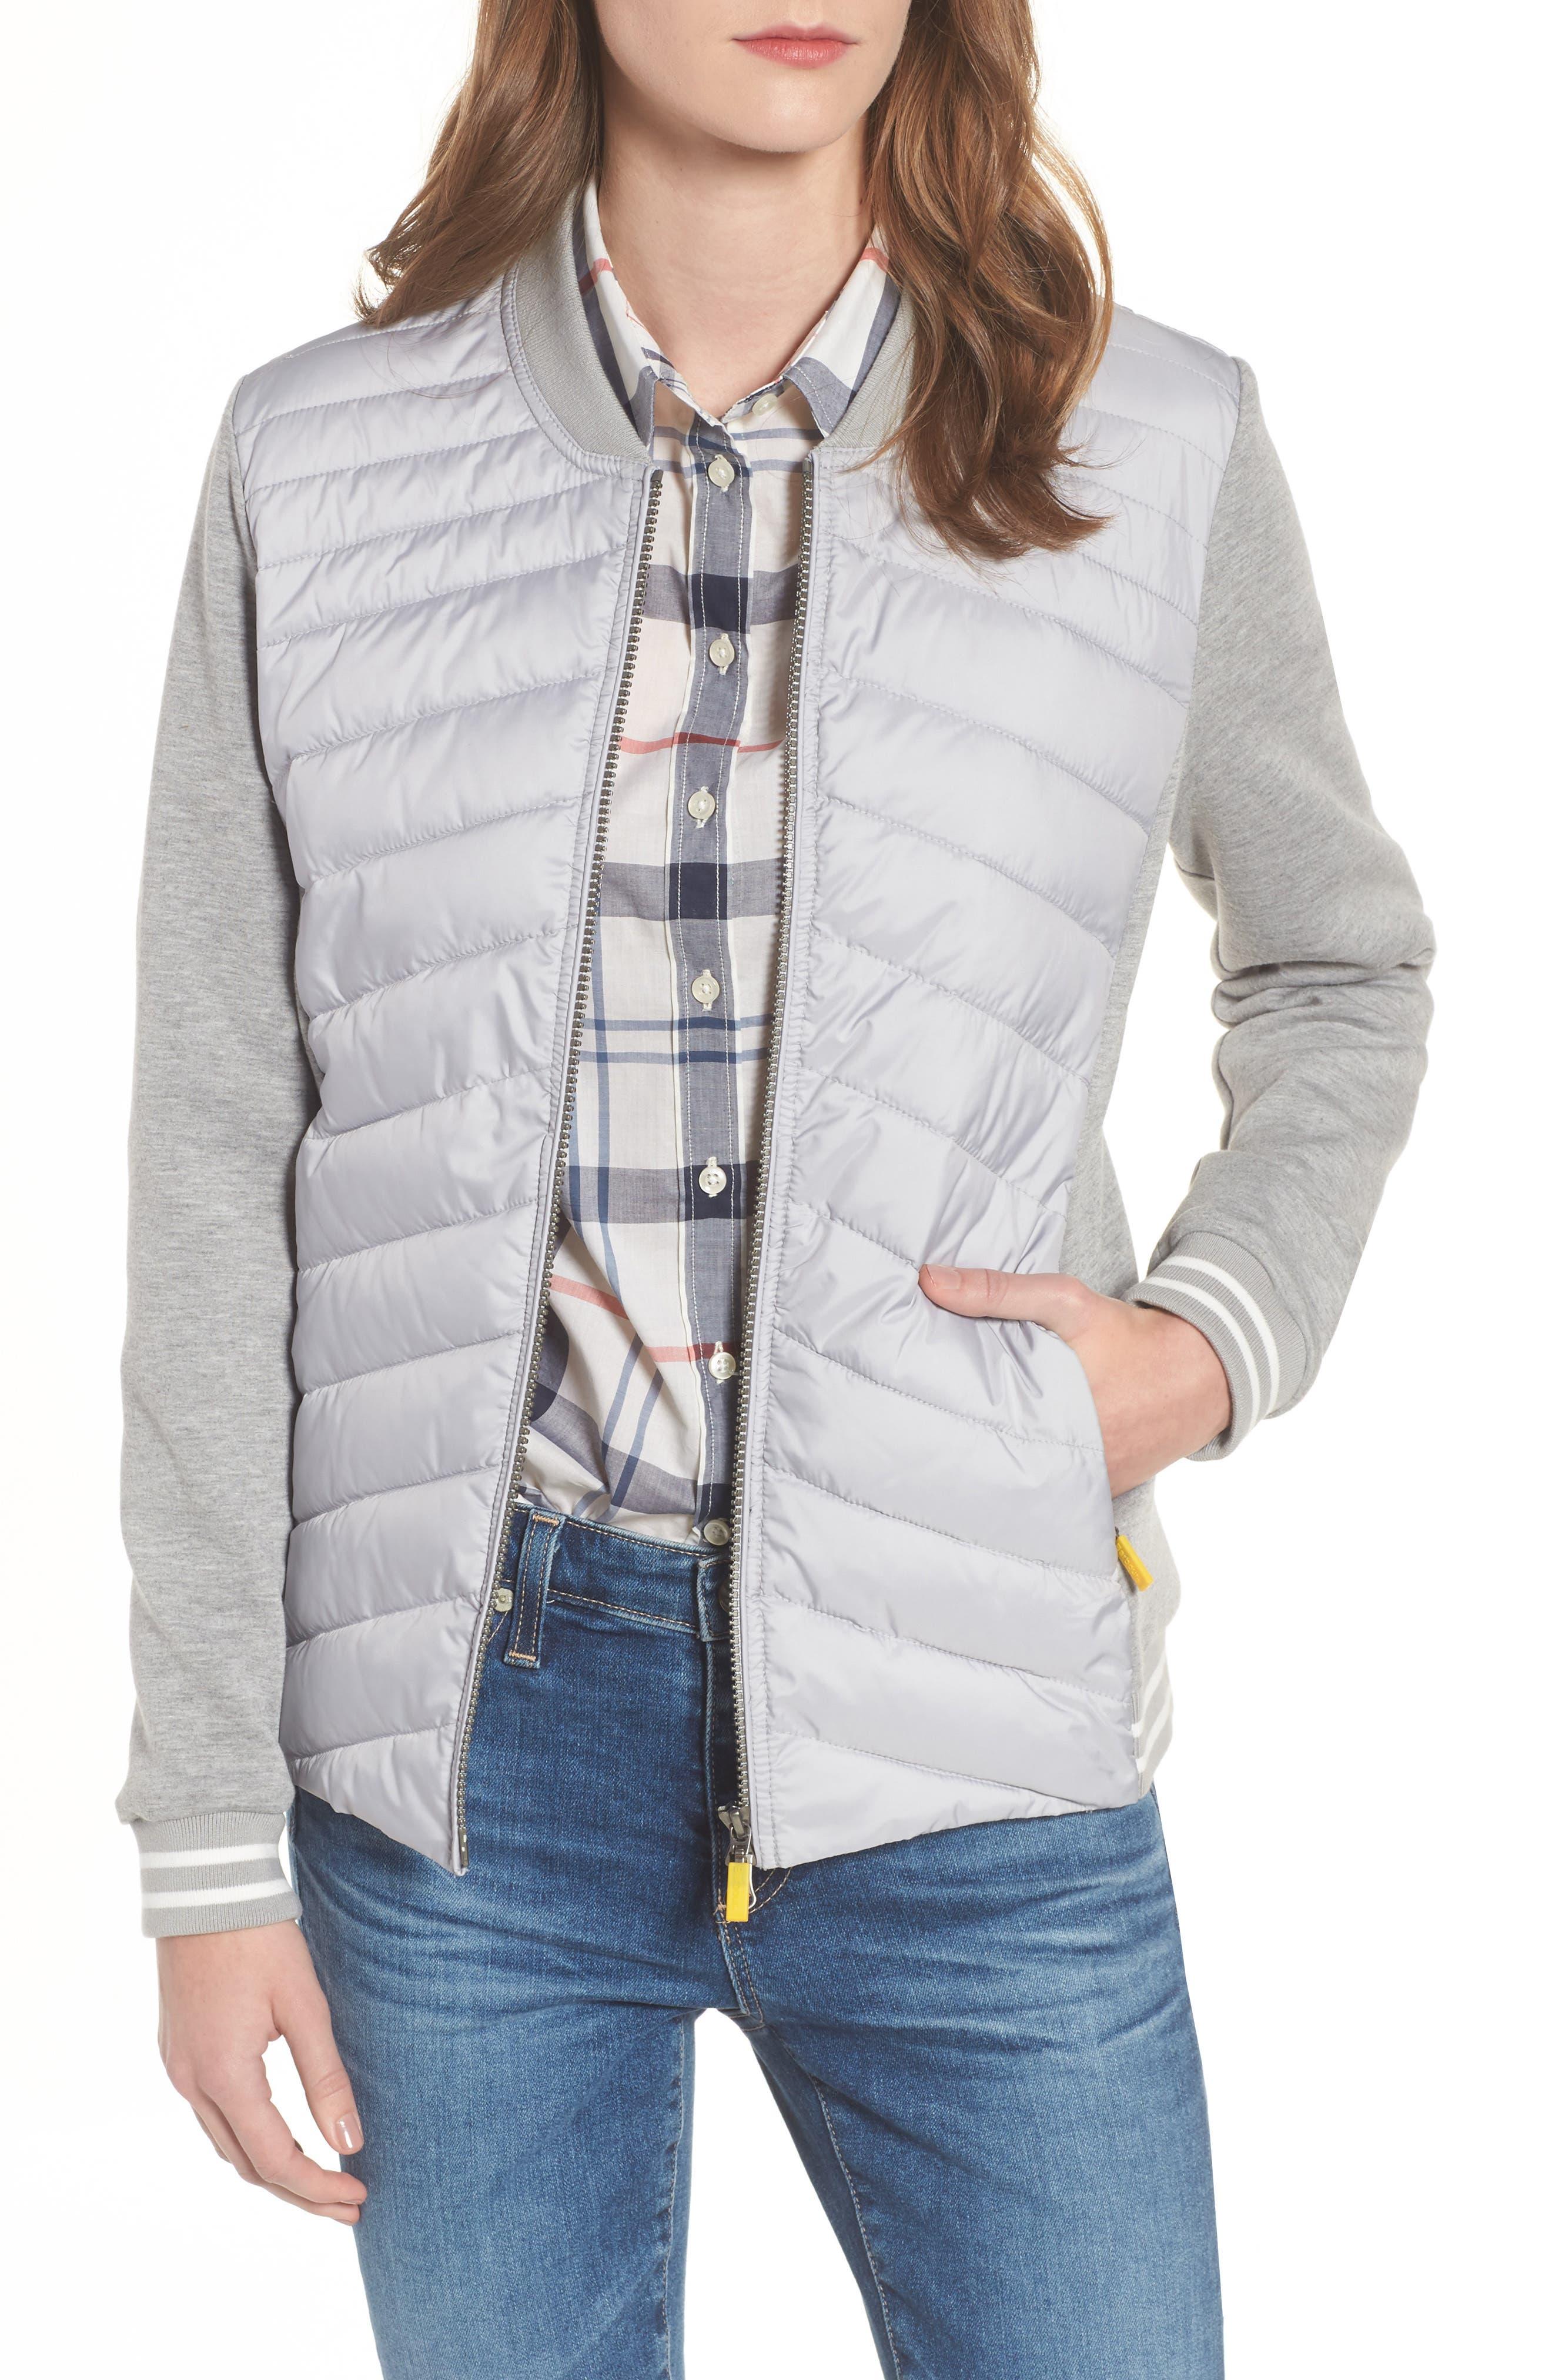 Pembrey Sweatshirt Jacket,                             Main thumbnail 1, color,                             050